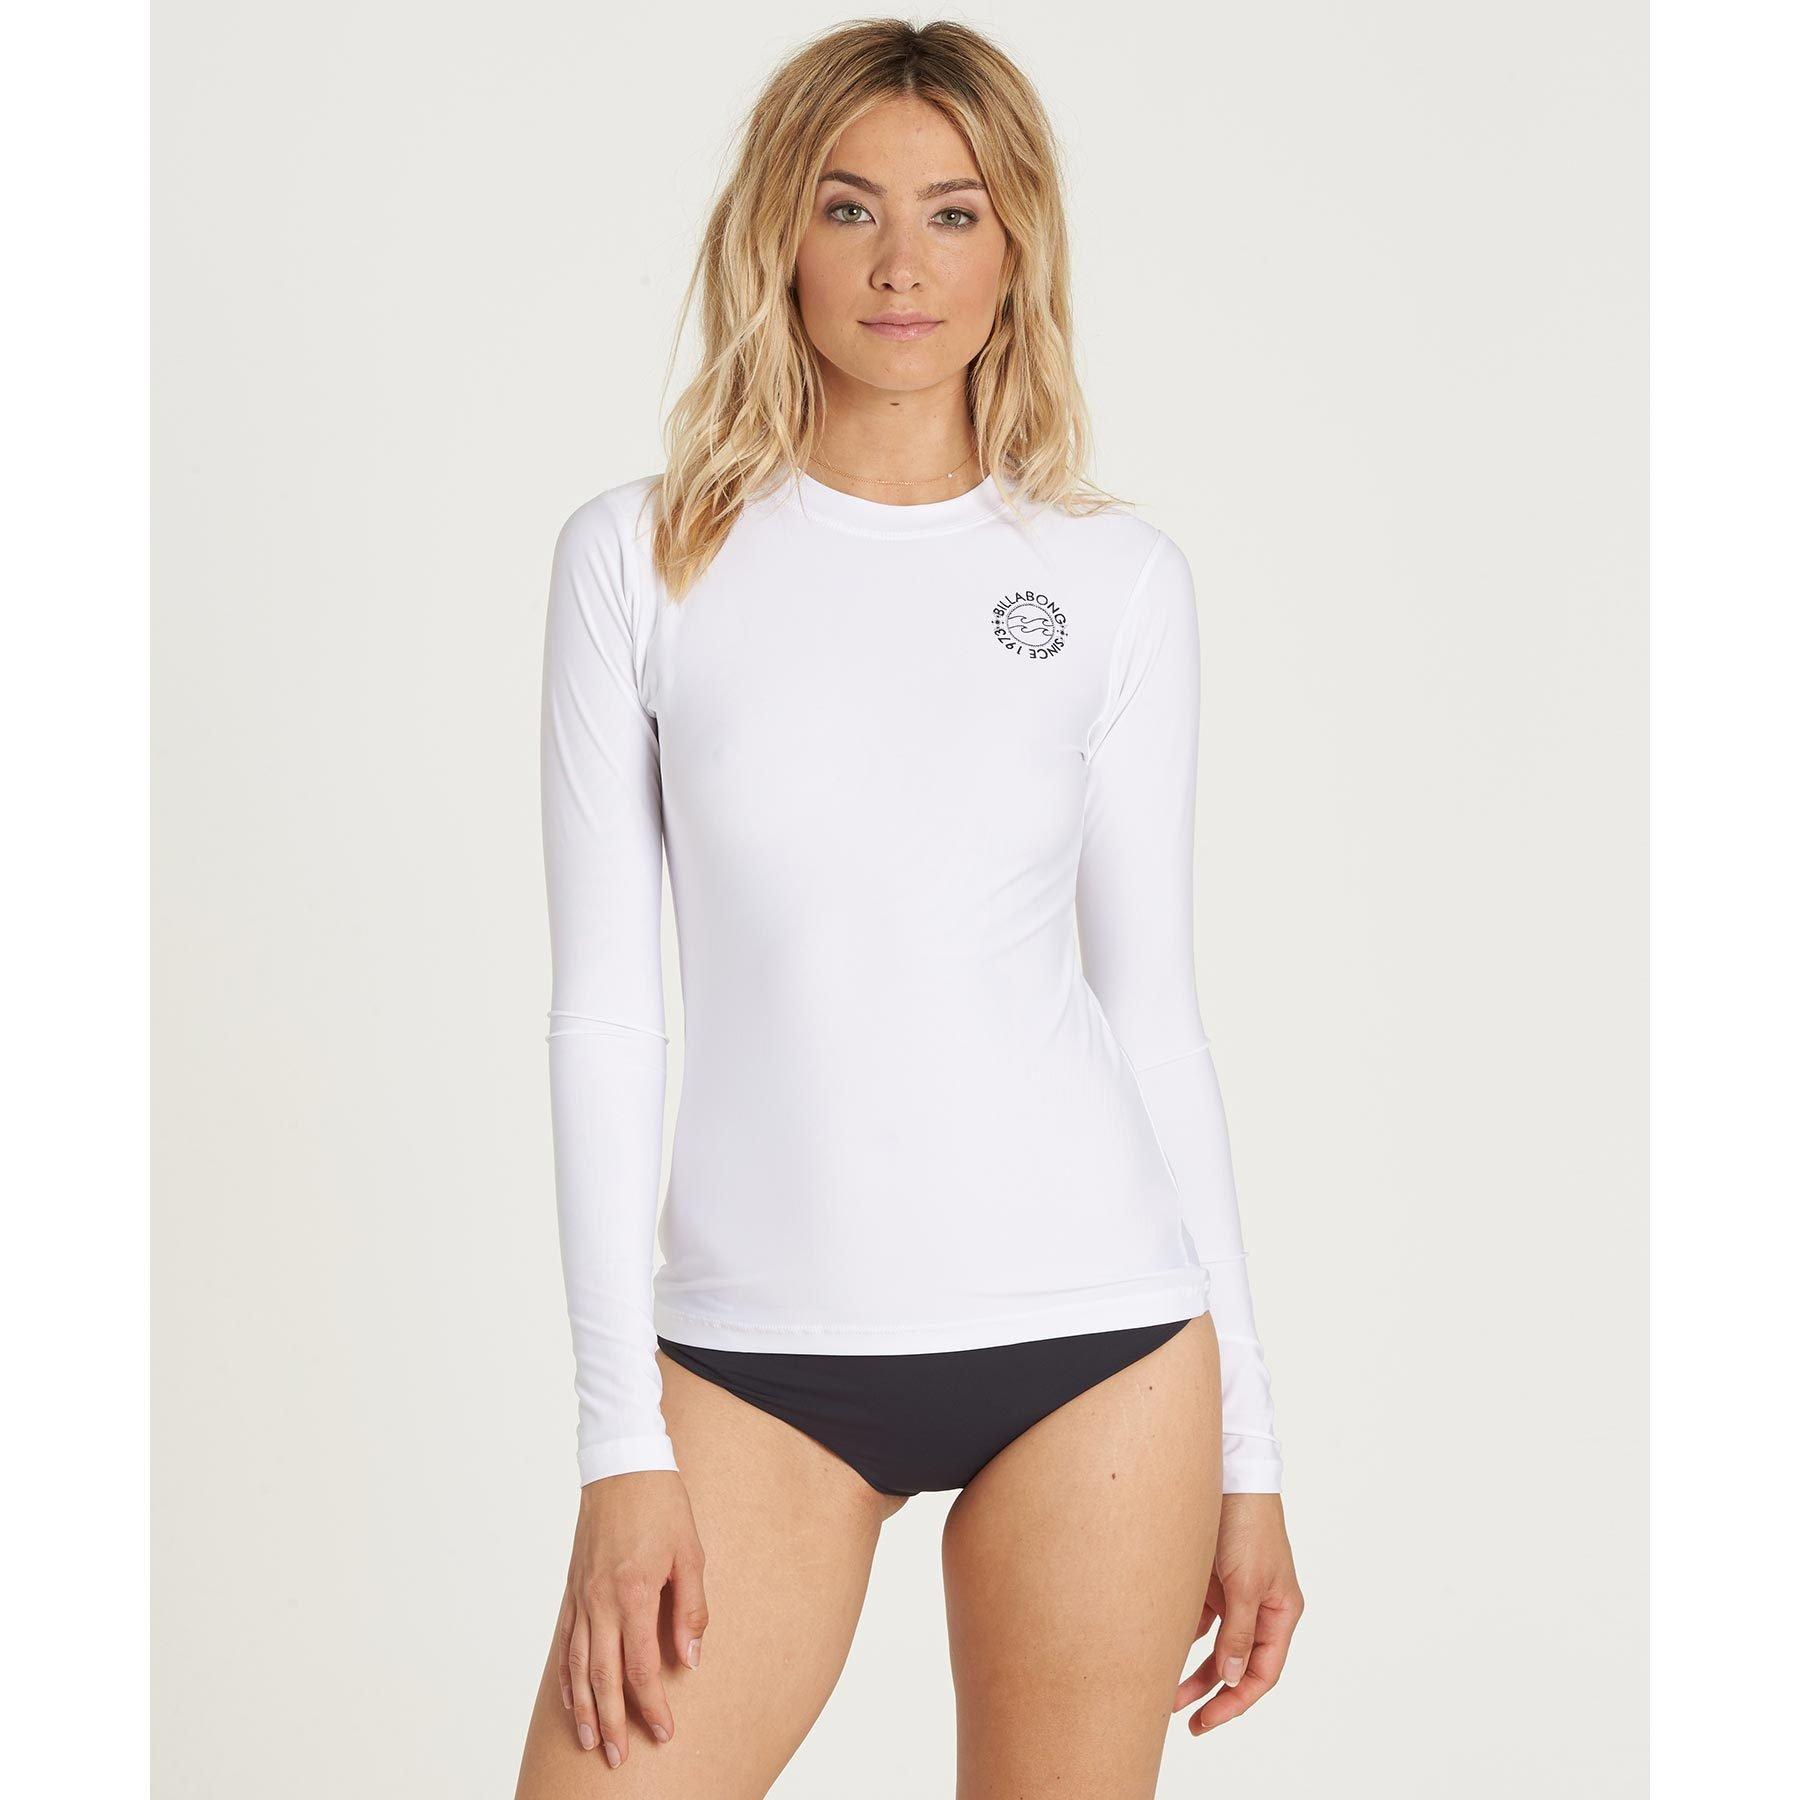 Billabong Women's Core Lose Fit Long-Sleeve Swim Rashguard, White, XS